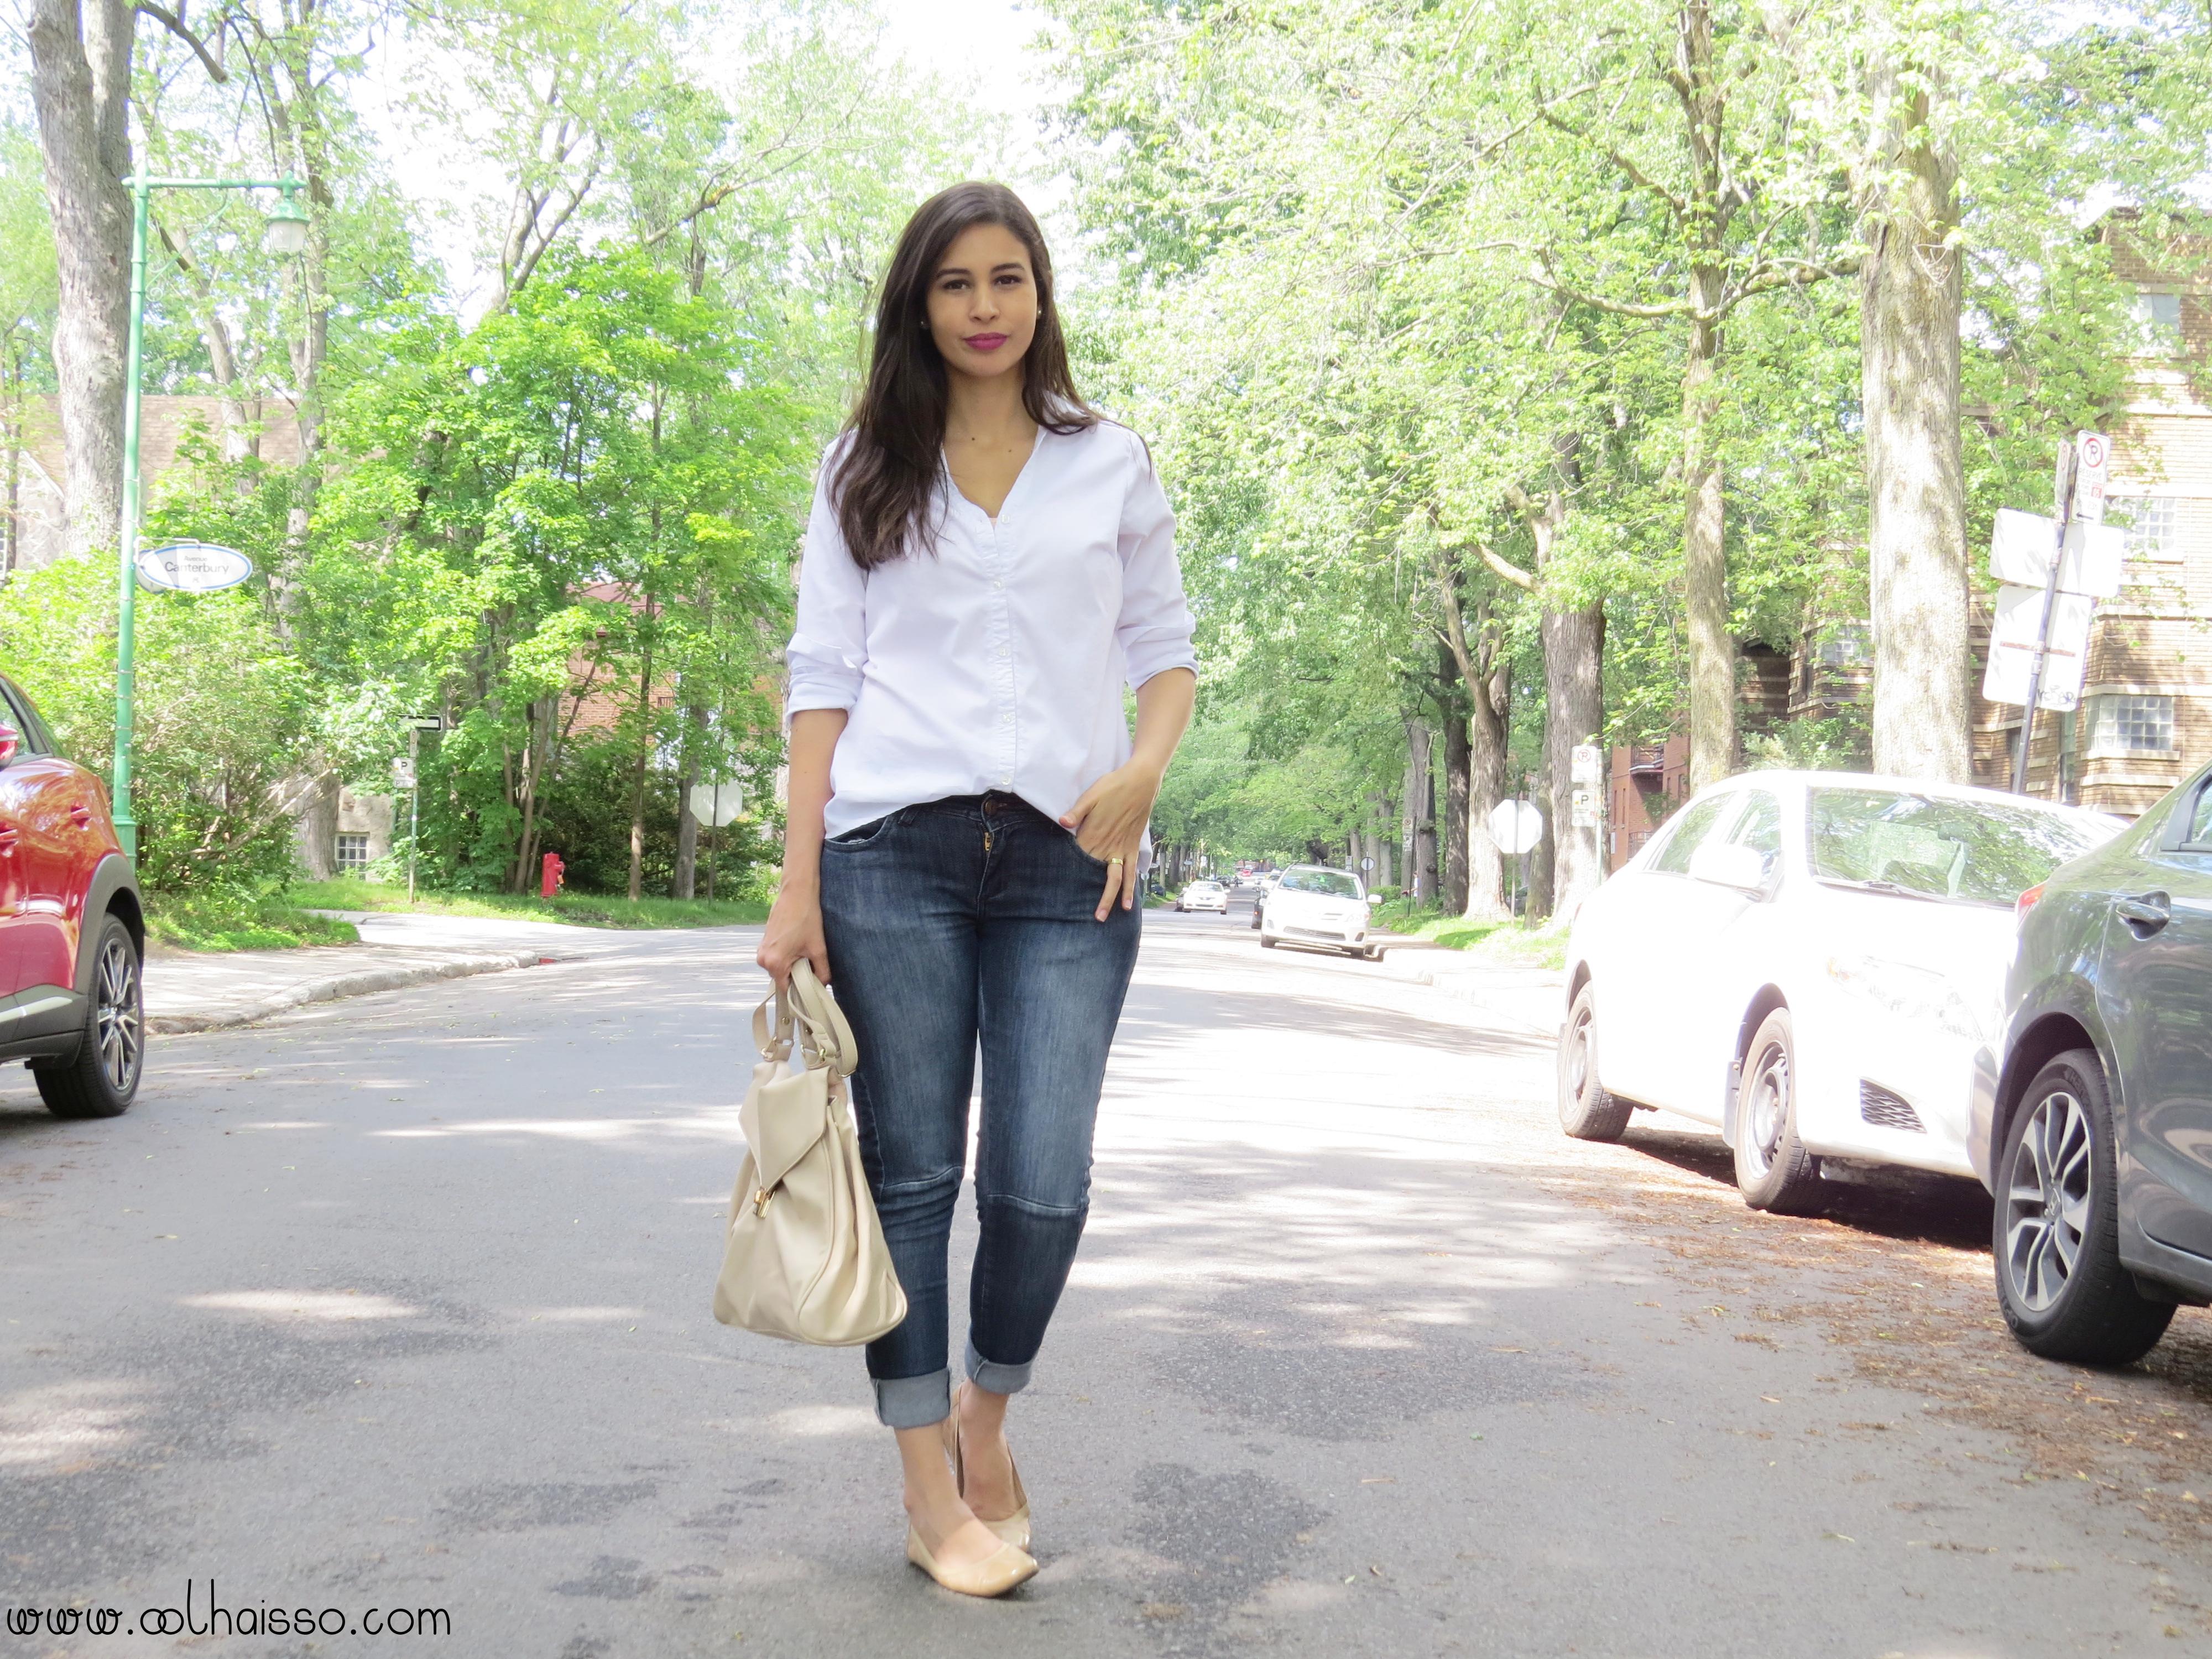 a27546e7d Jeans e camisa branca - como incrementar esse look? | Tallita Lisboa ...